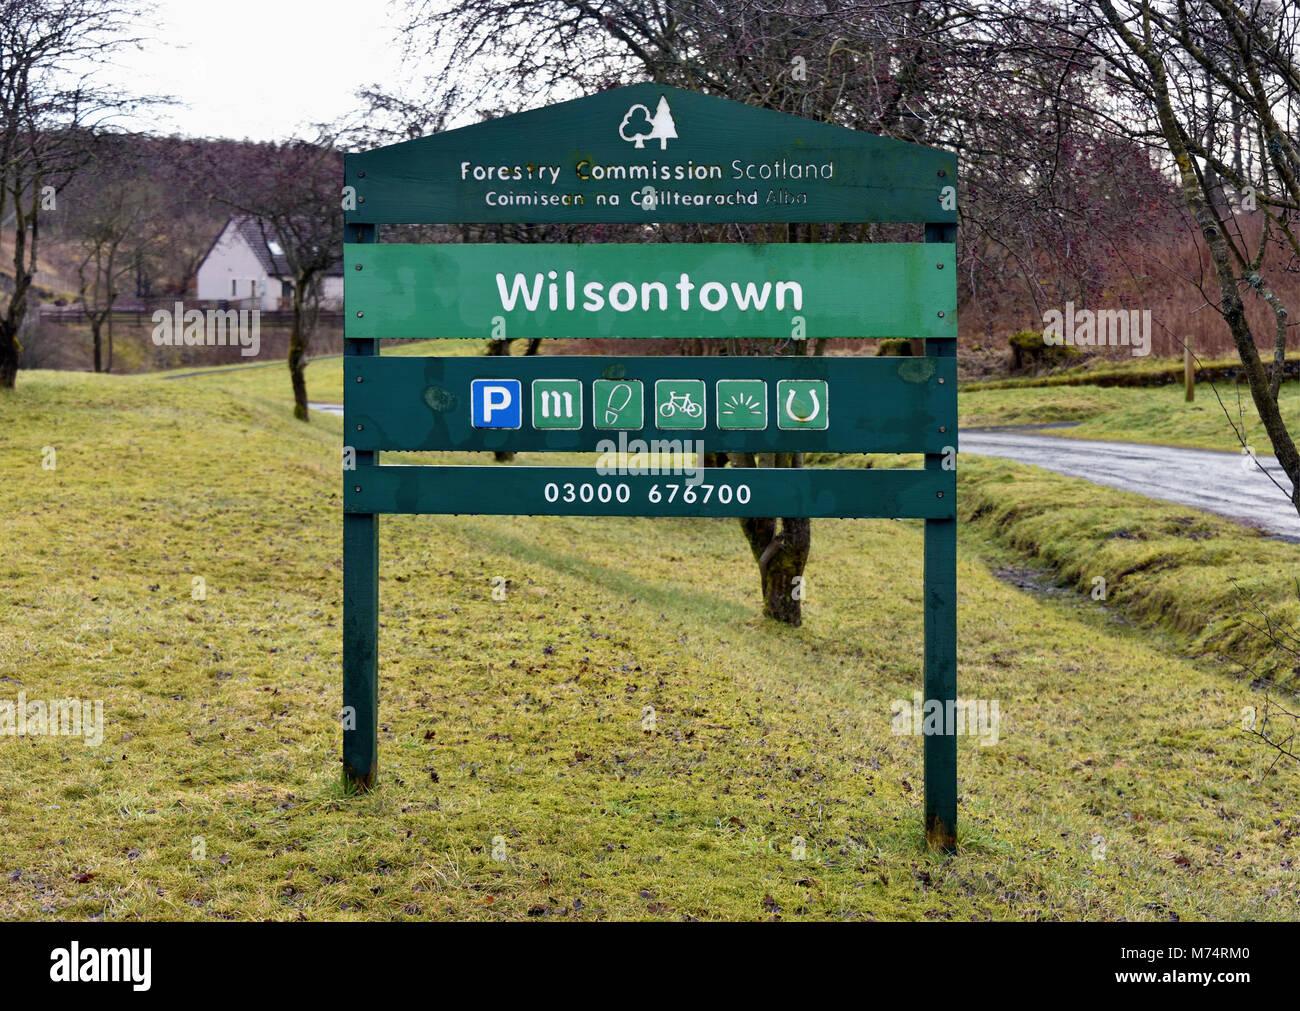 Forestry Commission Scotland signboard. Wilsontown, Forth, Lanarkshire, Scotland, United Kingdom, Europe. - Stock Image